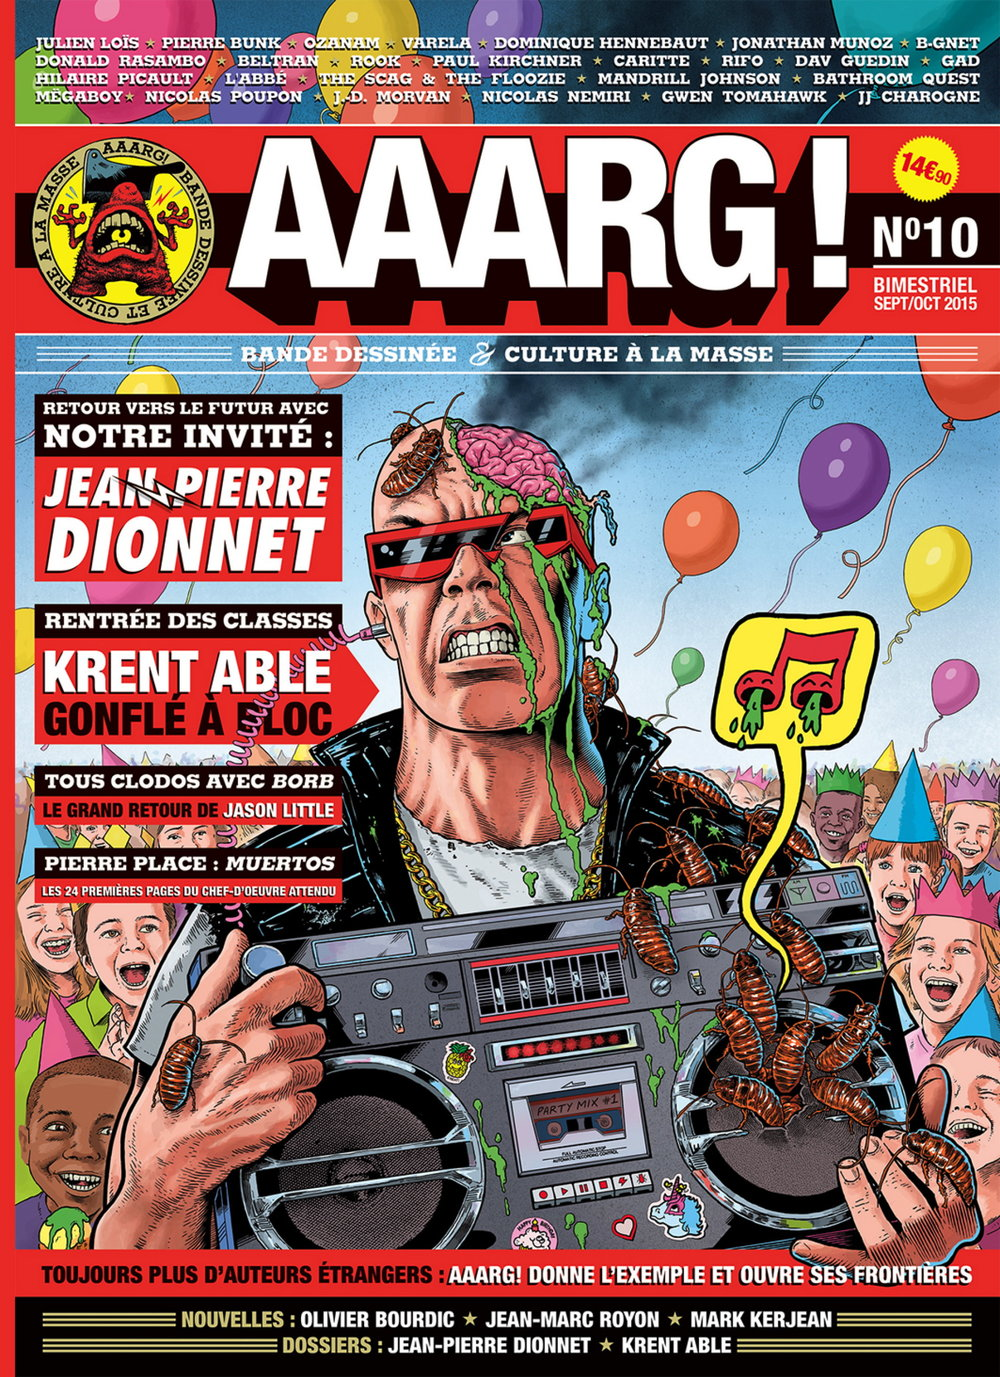 AAARG! Magazine cover 2015.jpg